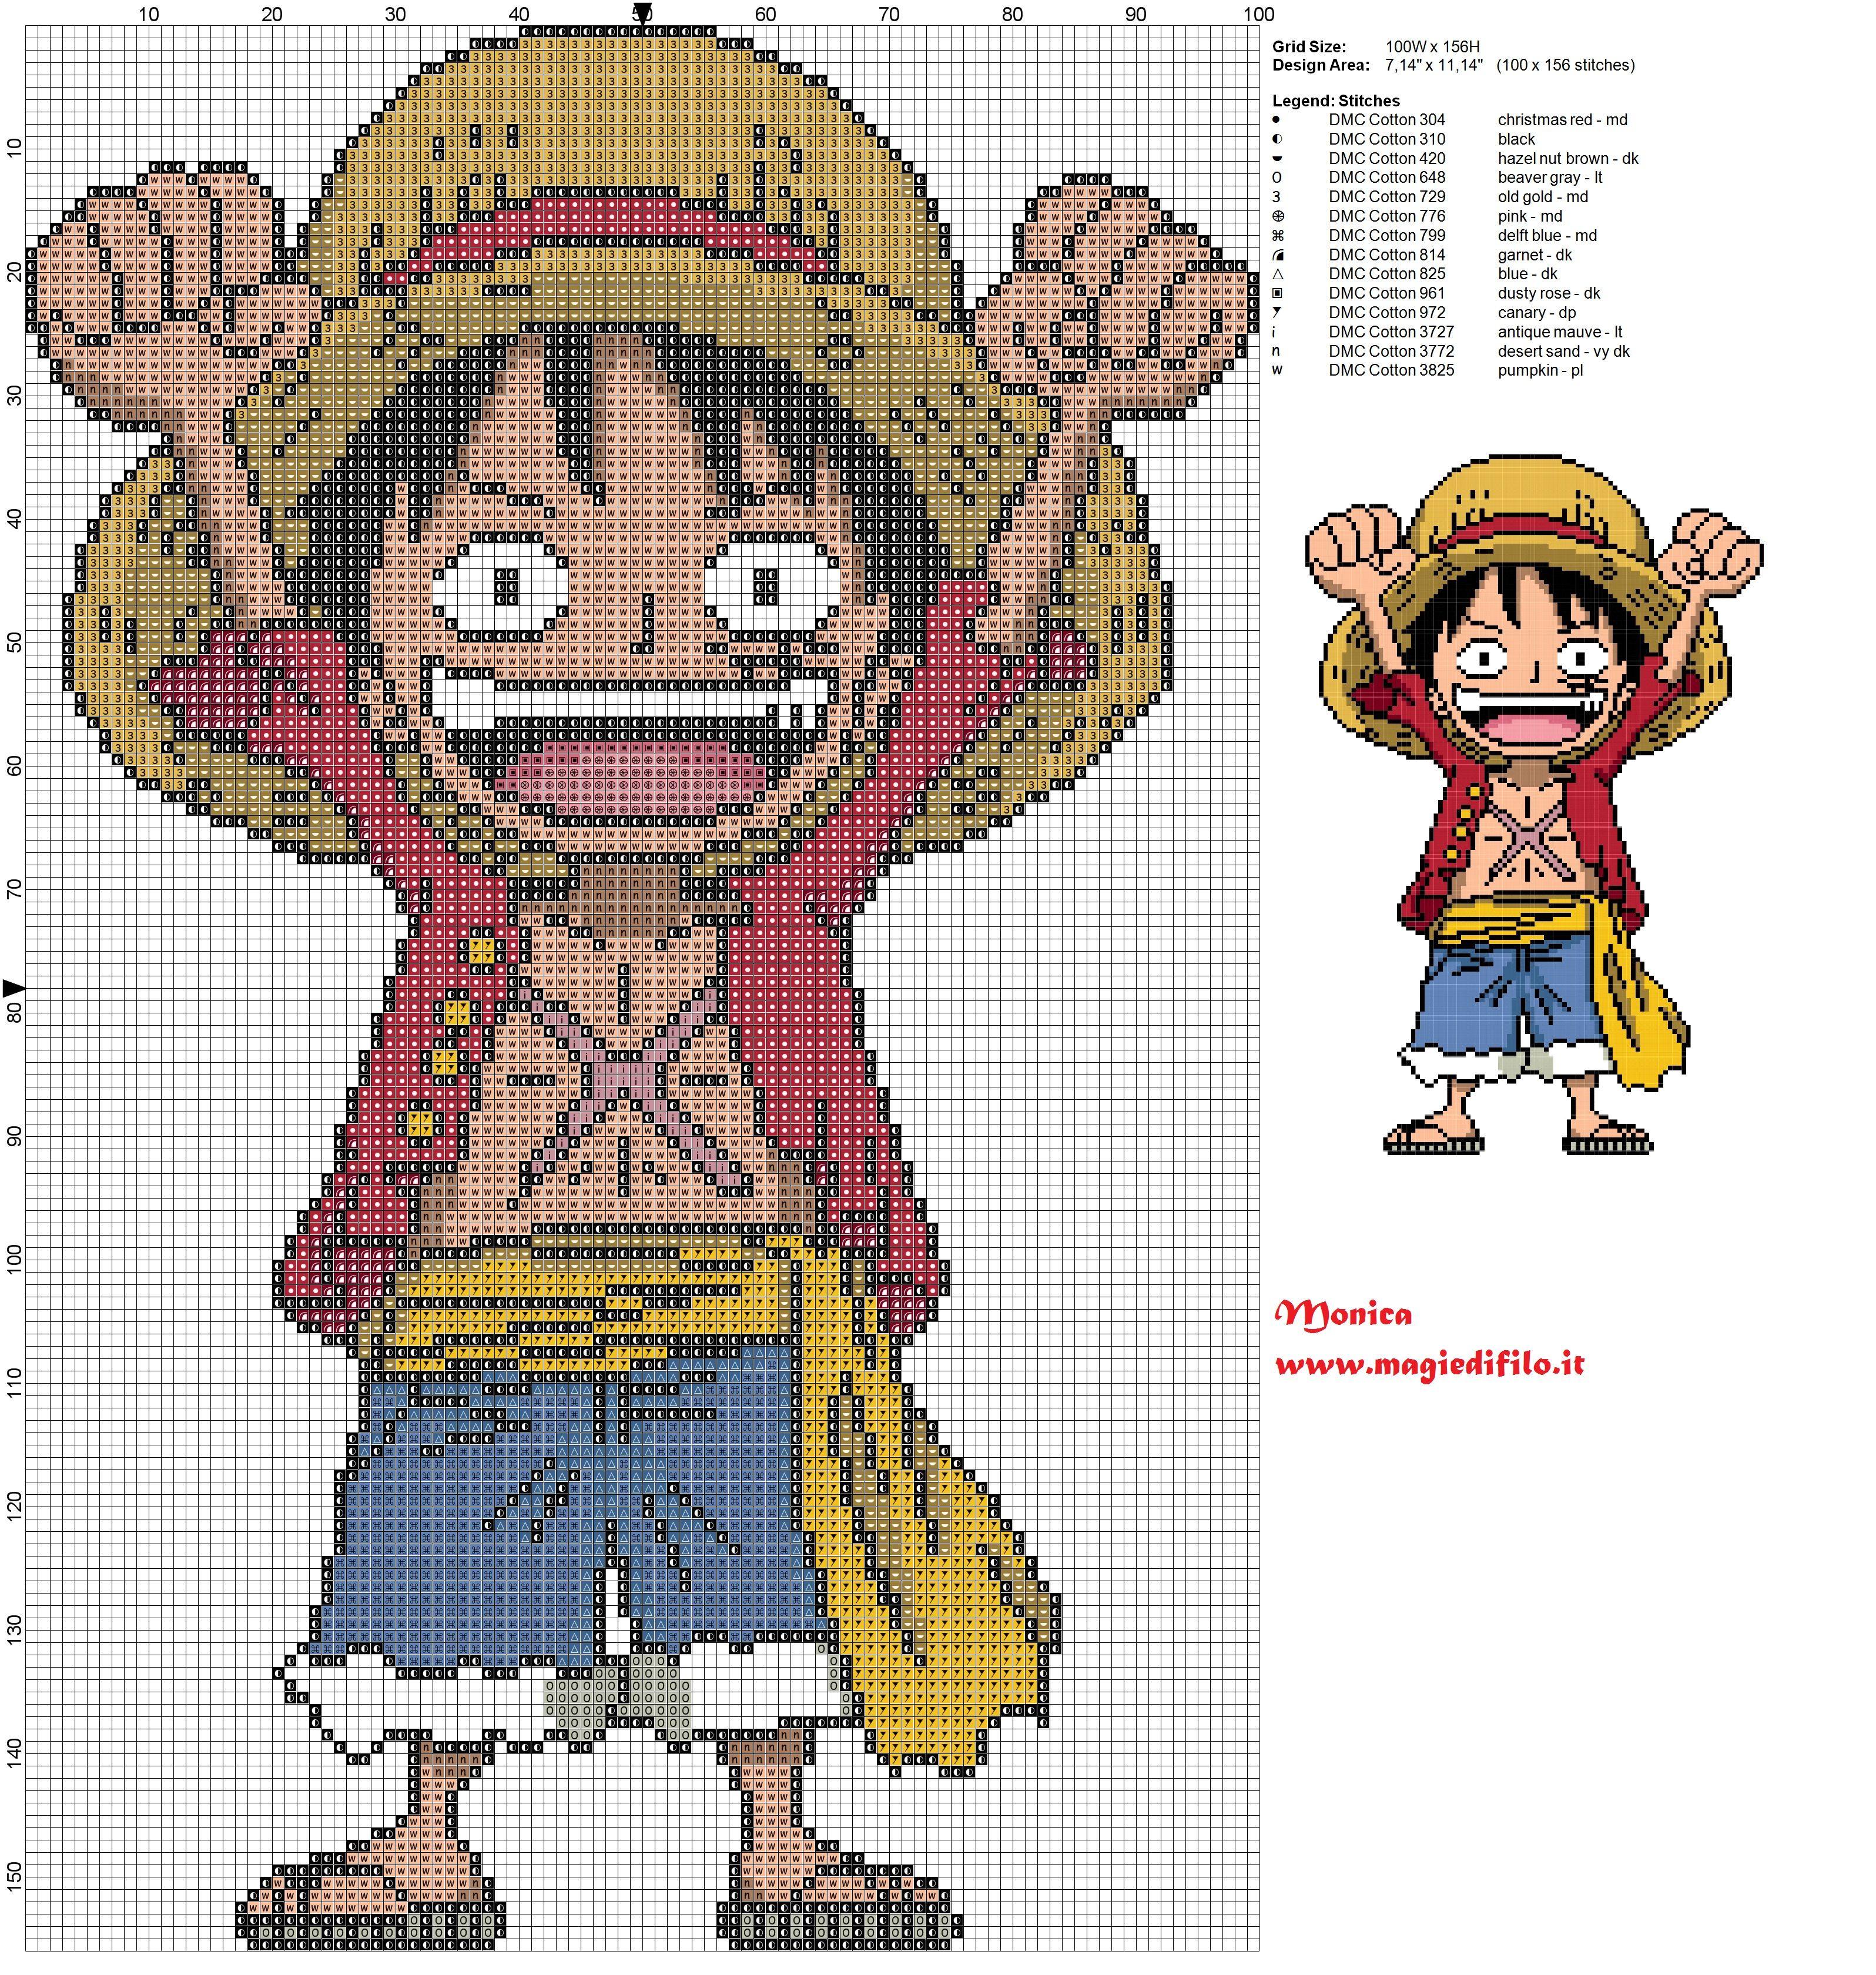 adoro esse anime クロスステッチ 図案 ステッチパターン 無料クロスステッチ